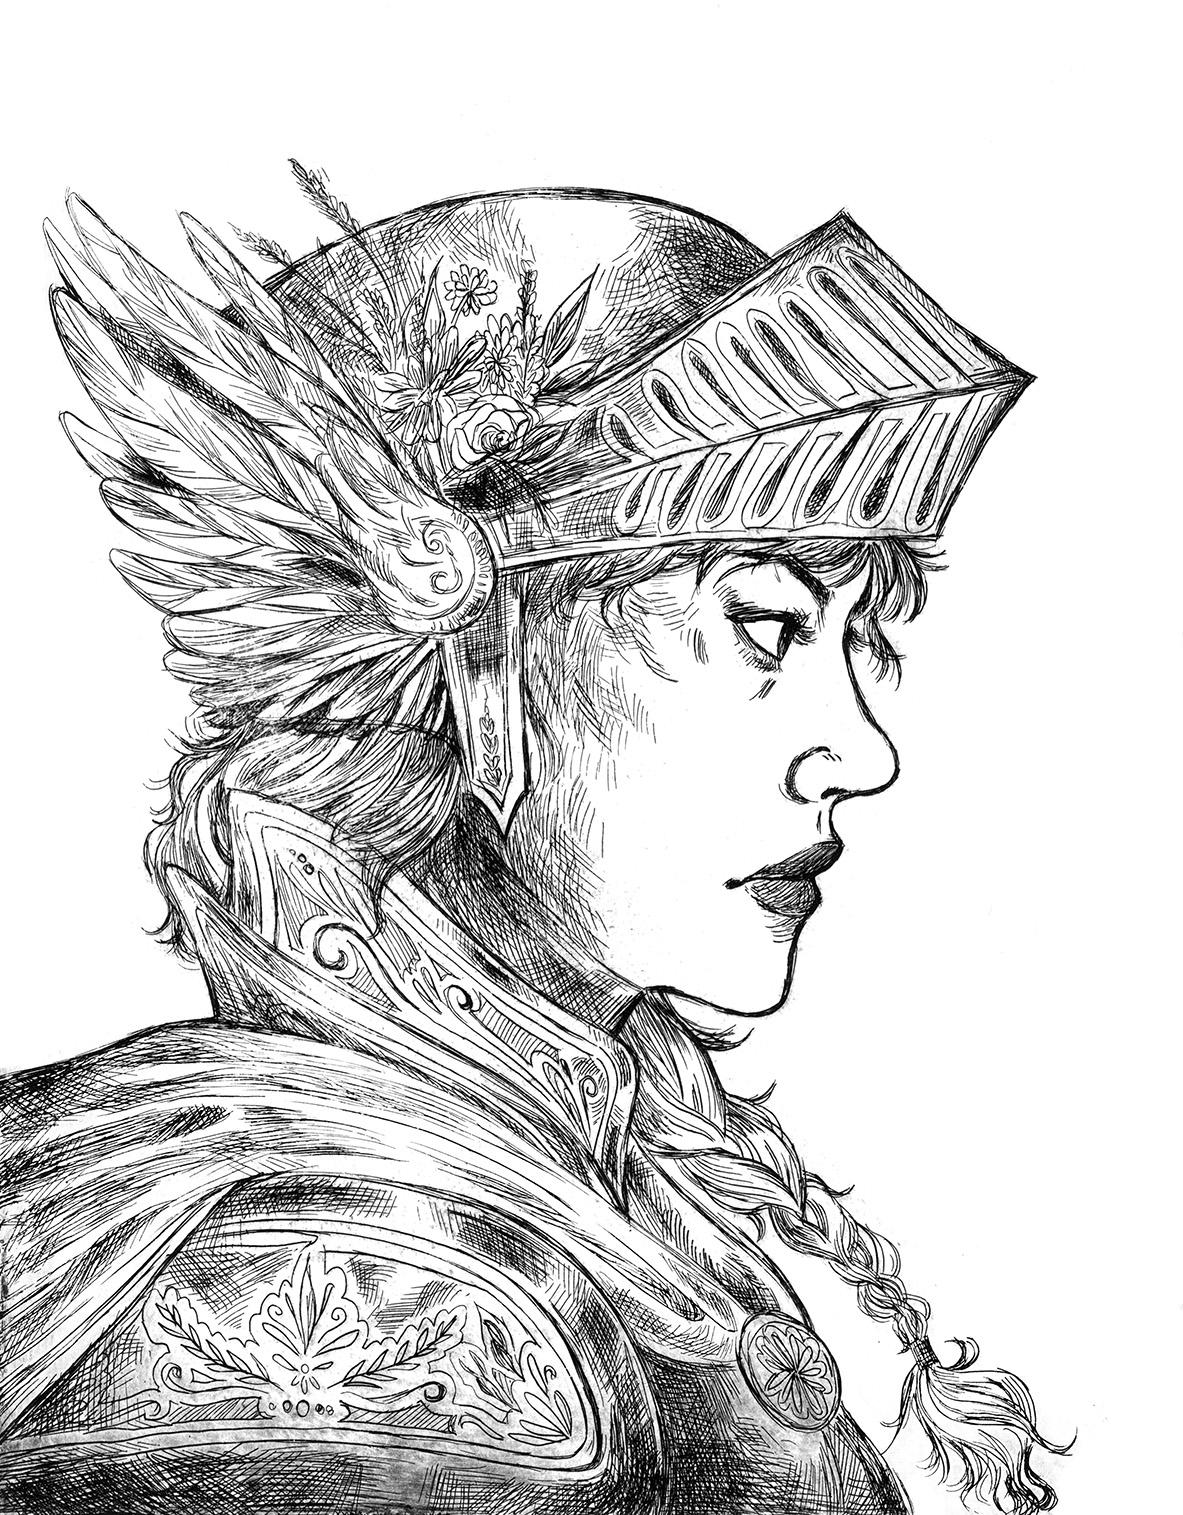 01_knight_zine.jpg